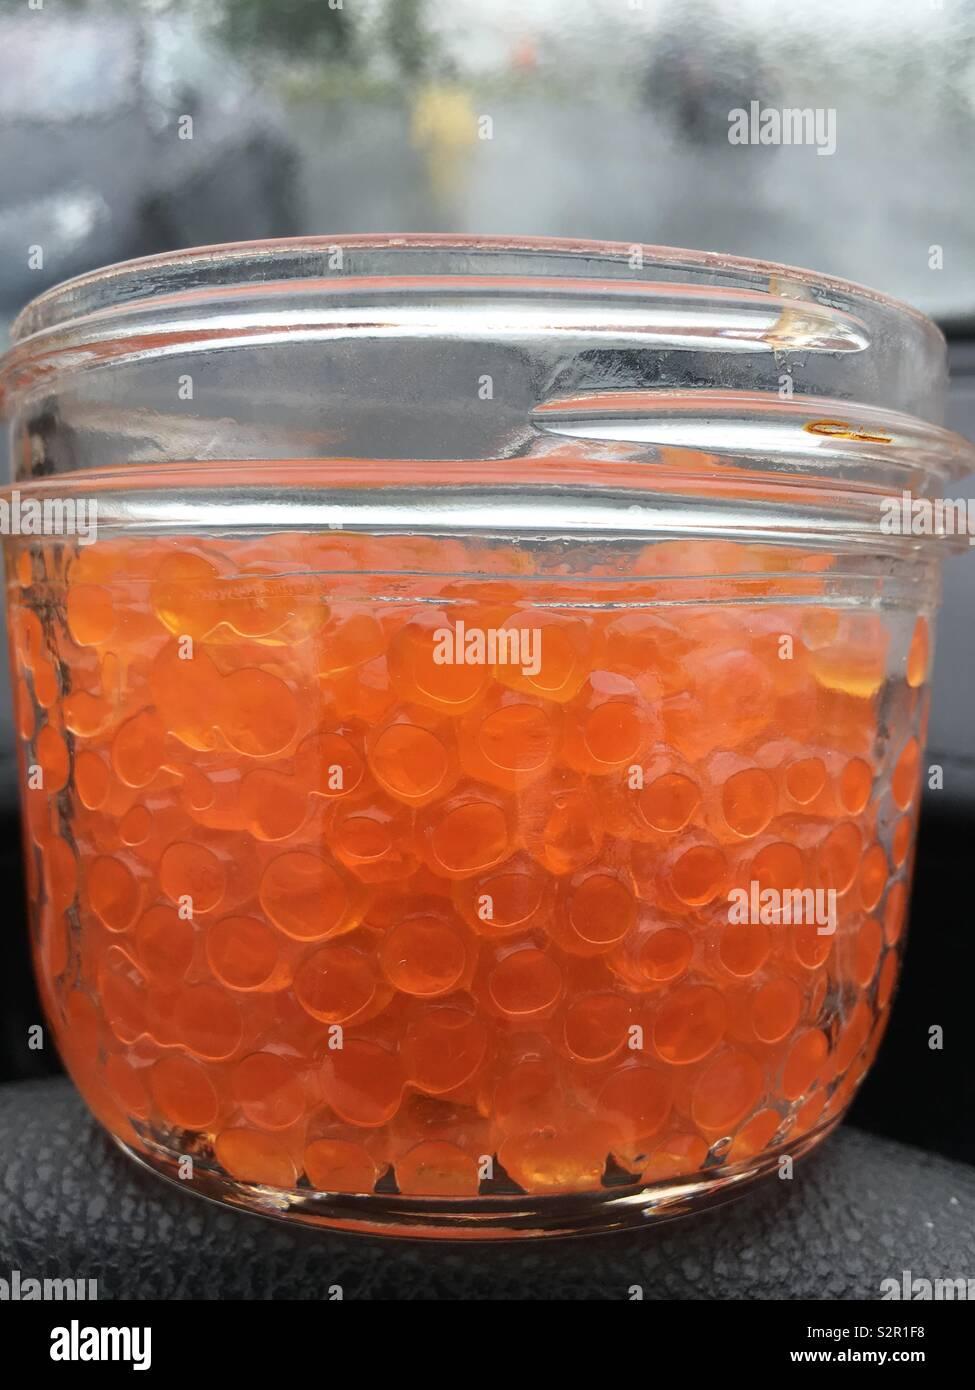 Glass jar of salmon caviar - Stock Image